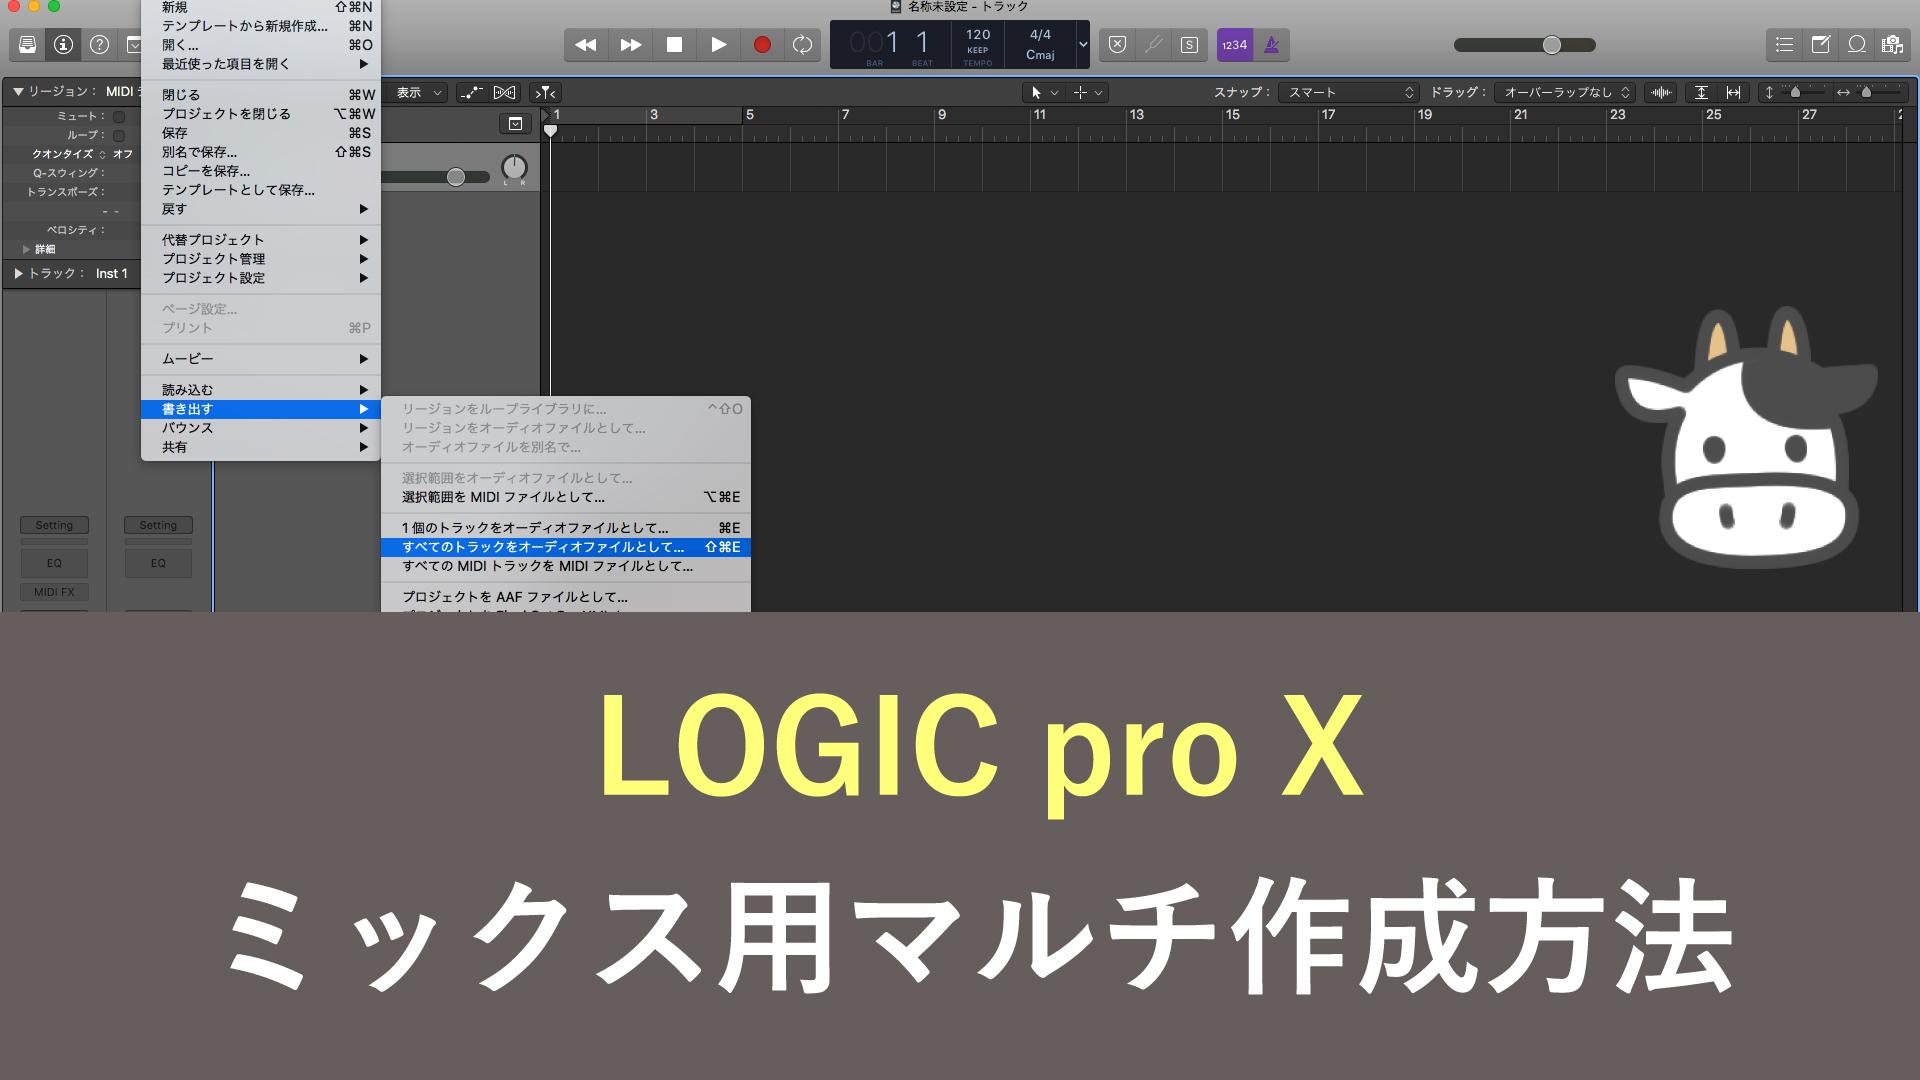 logic pro x マルチトラックWAVファイルの作成方法